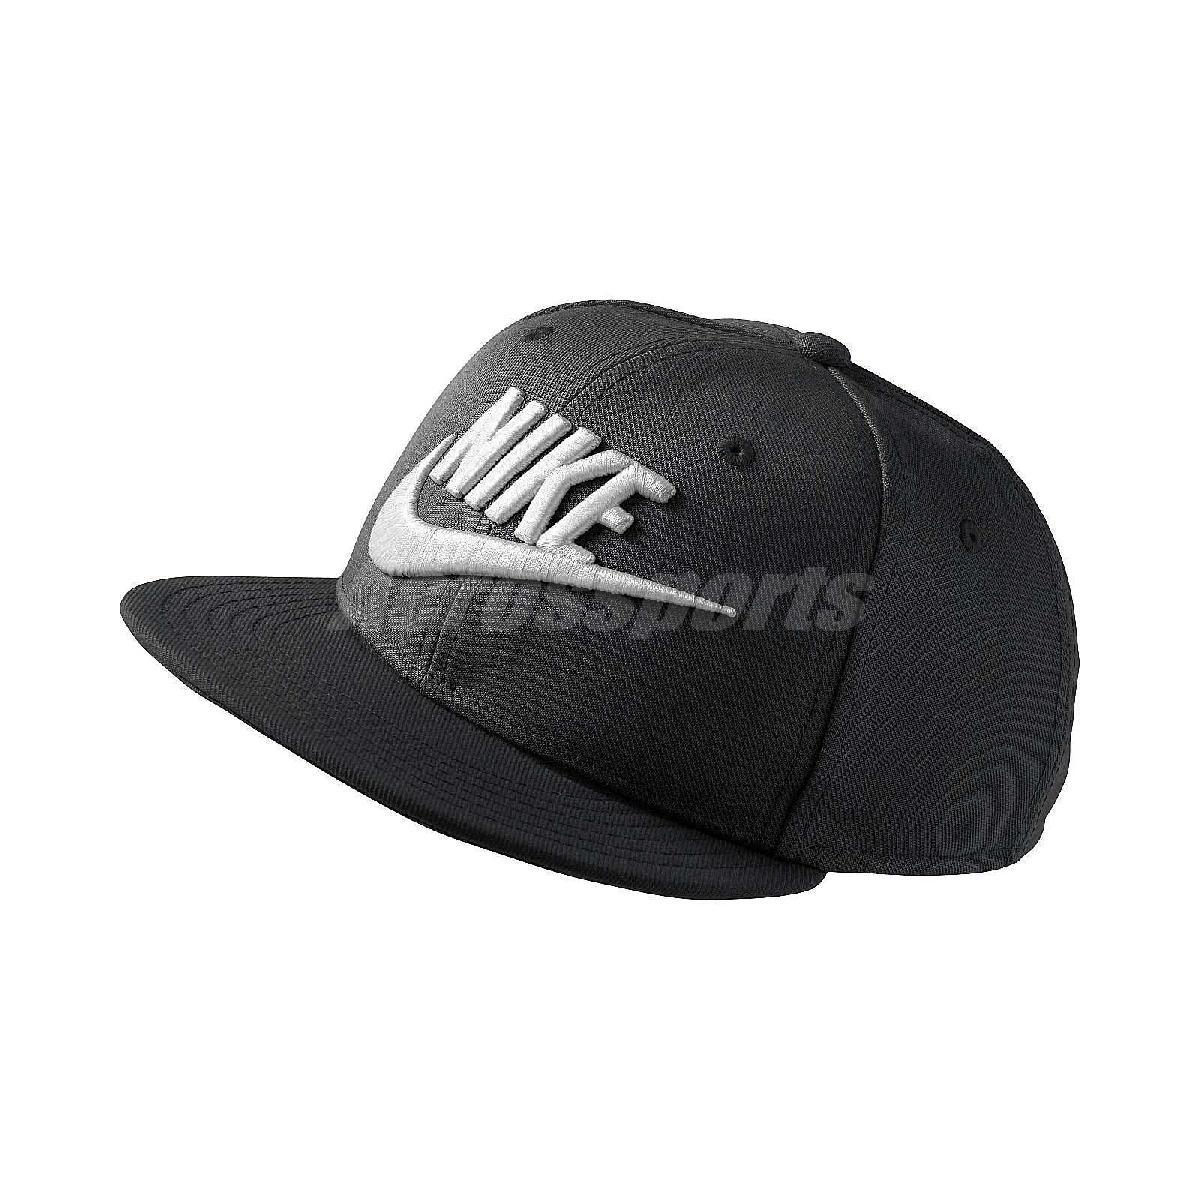 Nike 帽子 True Cap Futura 基本款 黑 白 男女款 可調式 棒球帽 【PUMP306】 614590-010